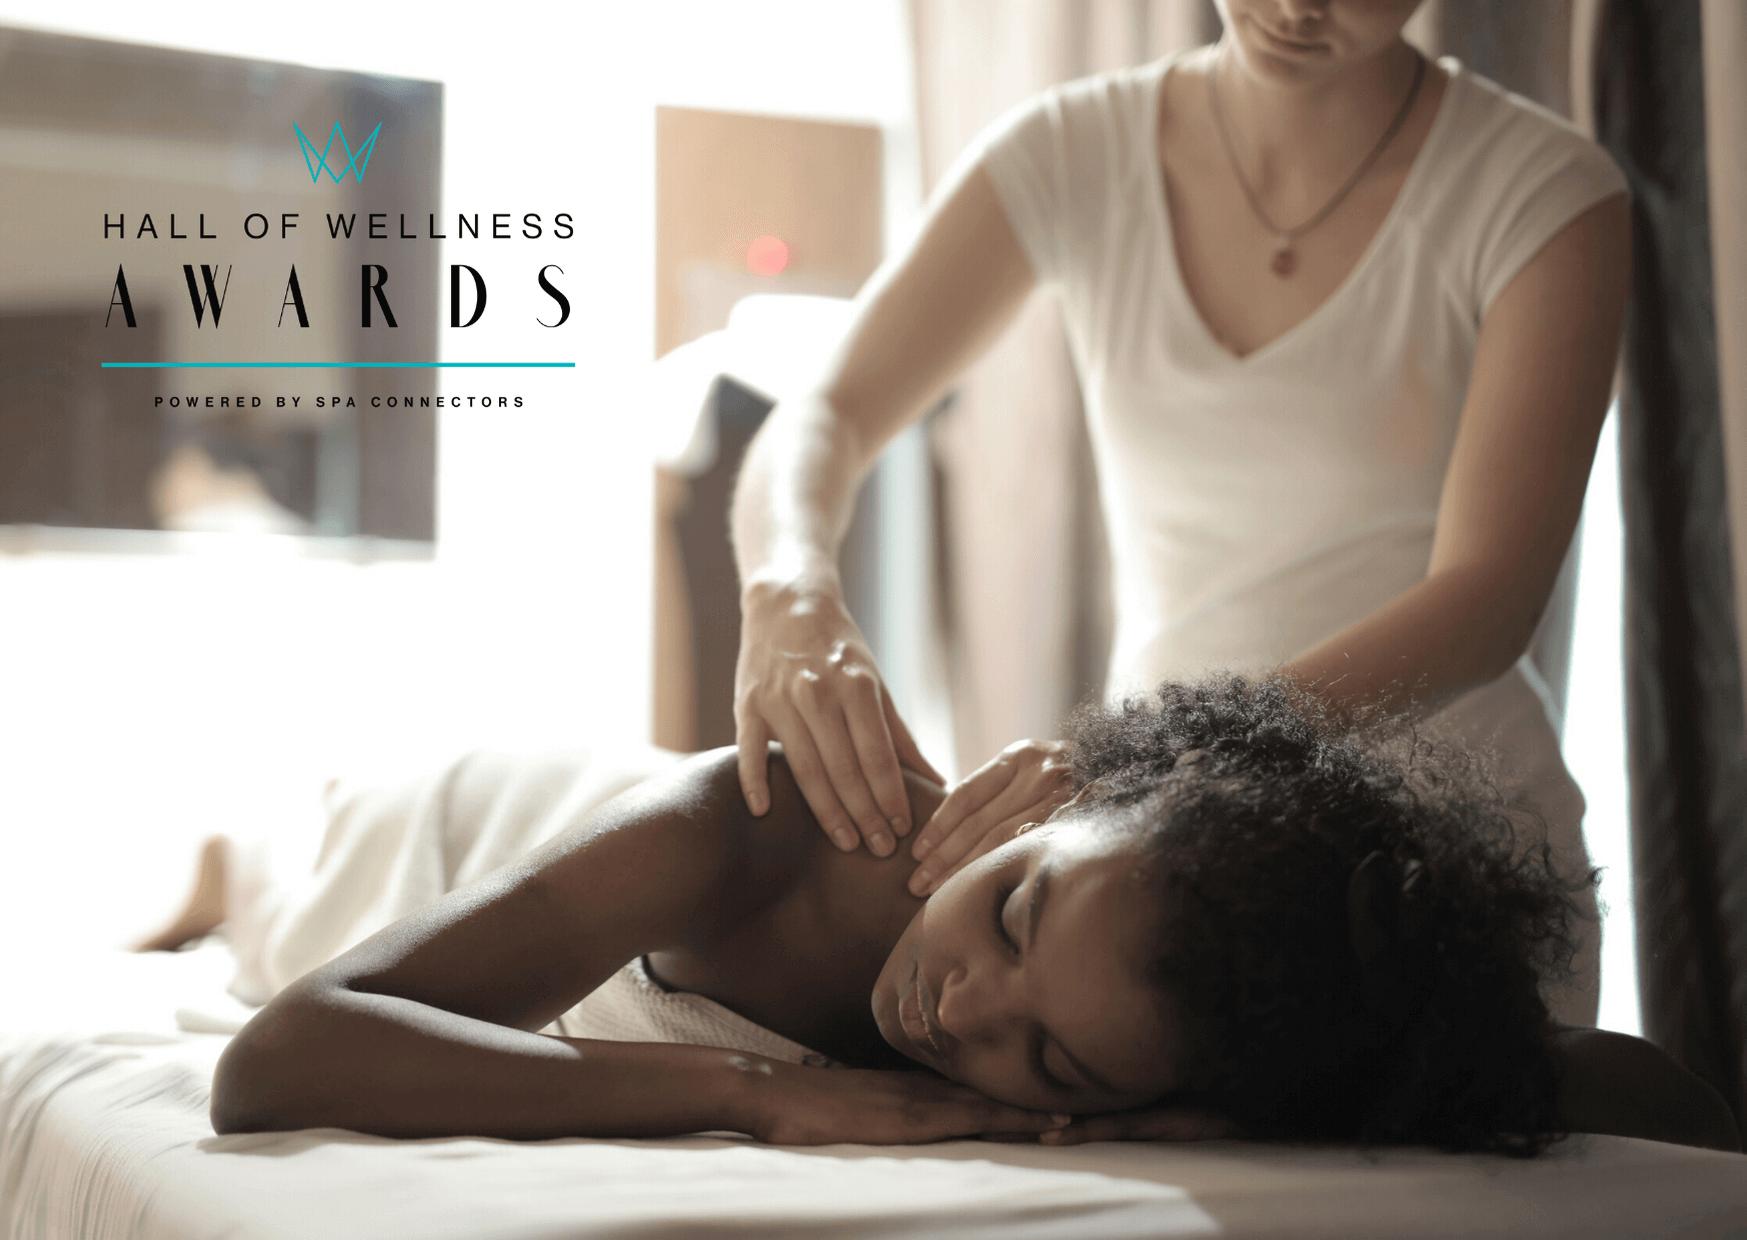 Introducing: Hall of Wellness Awards